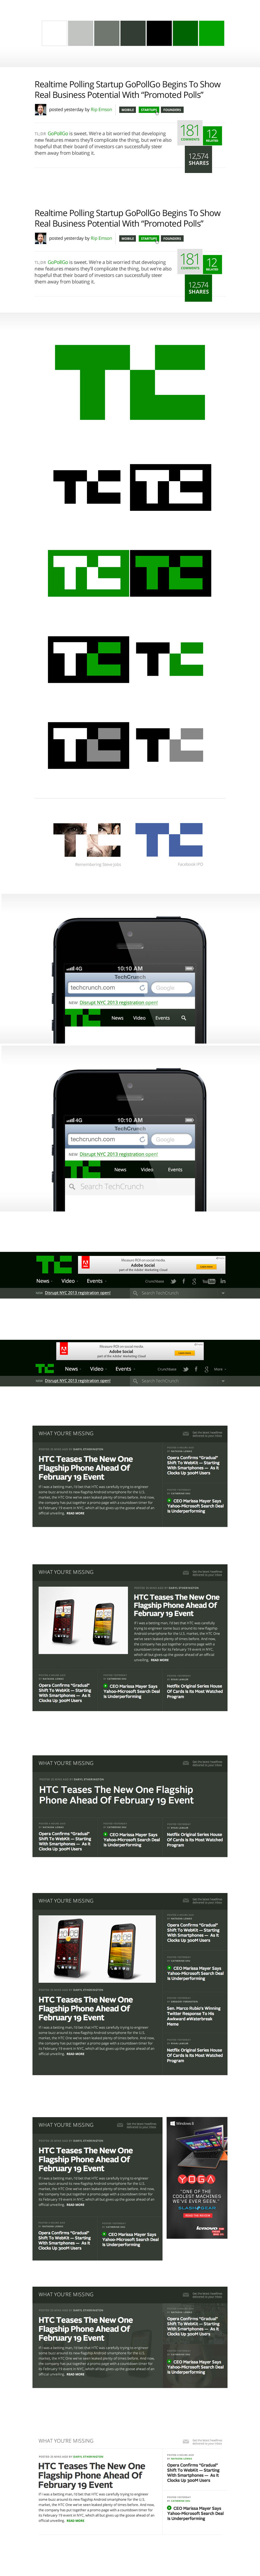 TechCrunch 2013: Typography